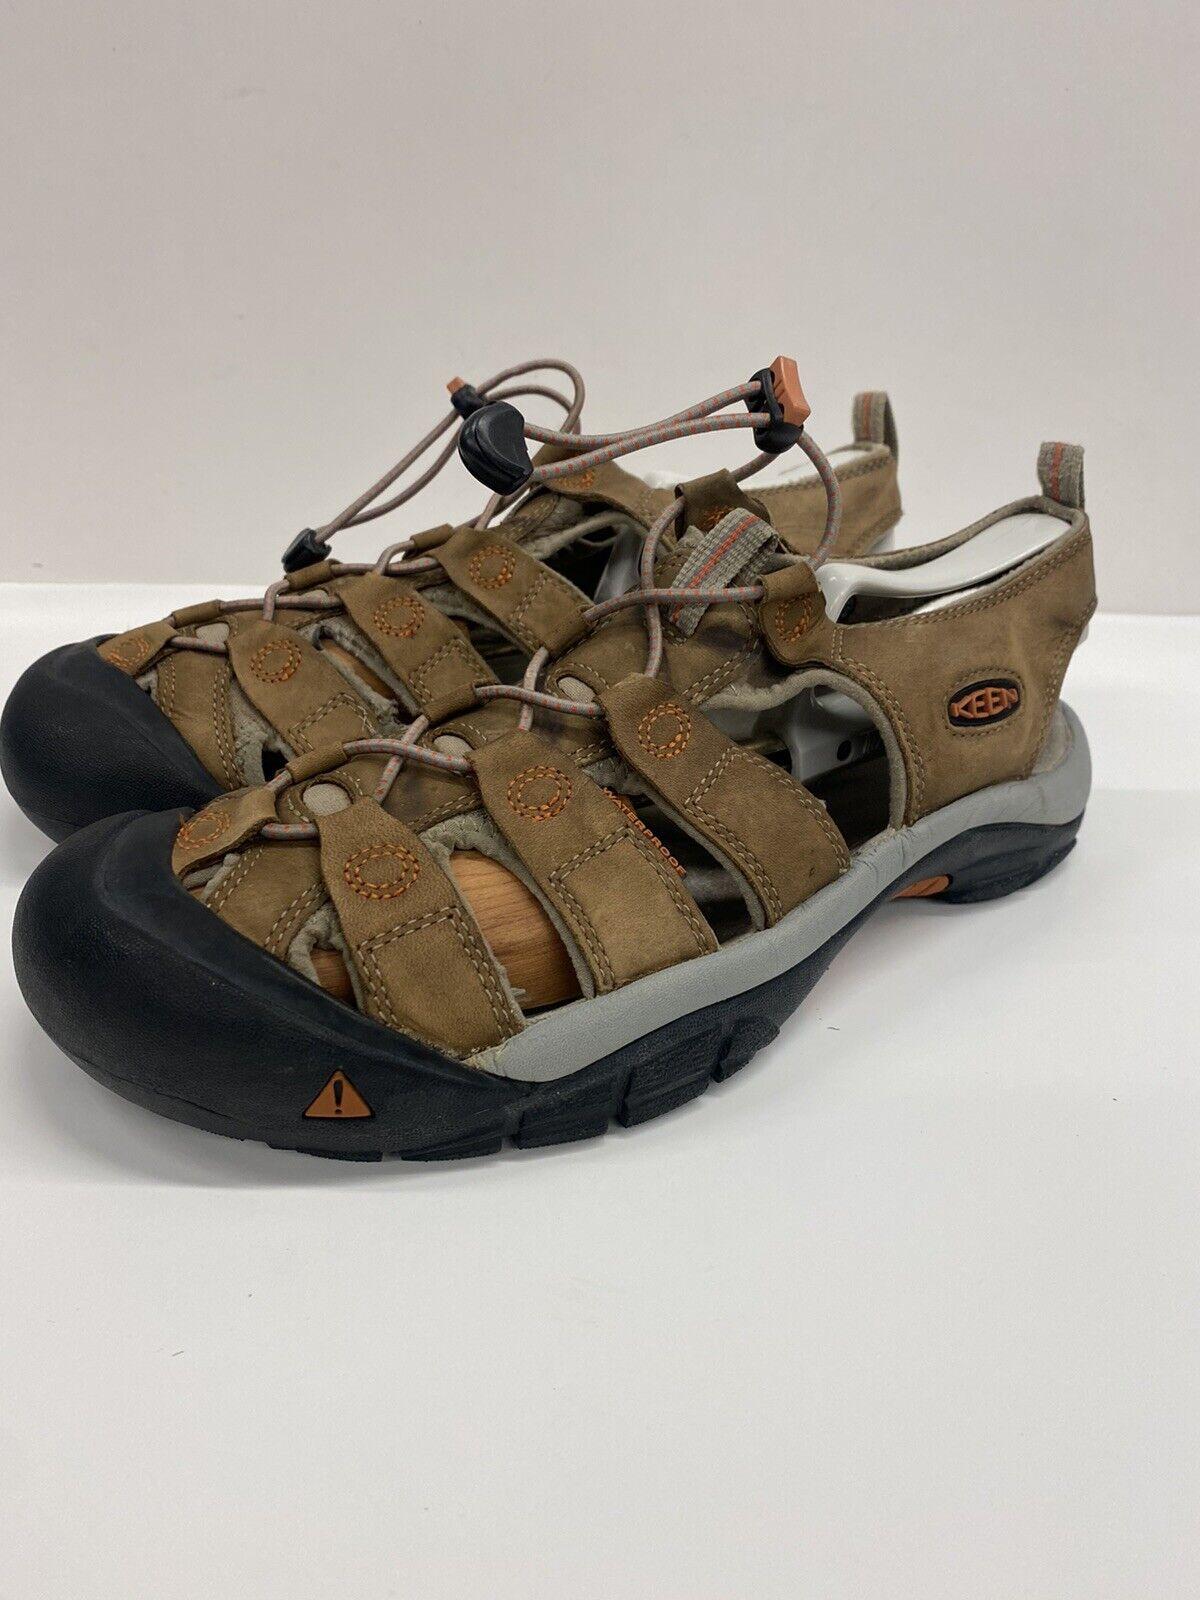 Keen Men's Newport Brown Drawstring Hiking Trail Pool Sandals Size 10